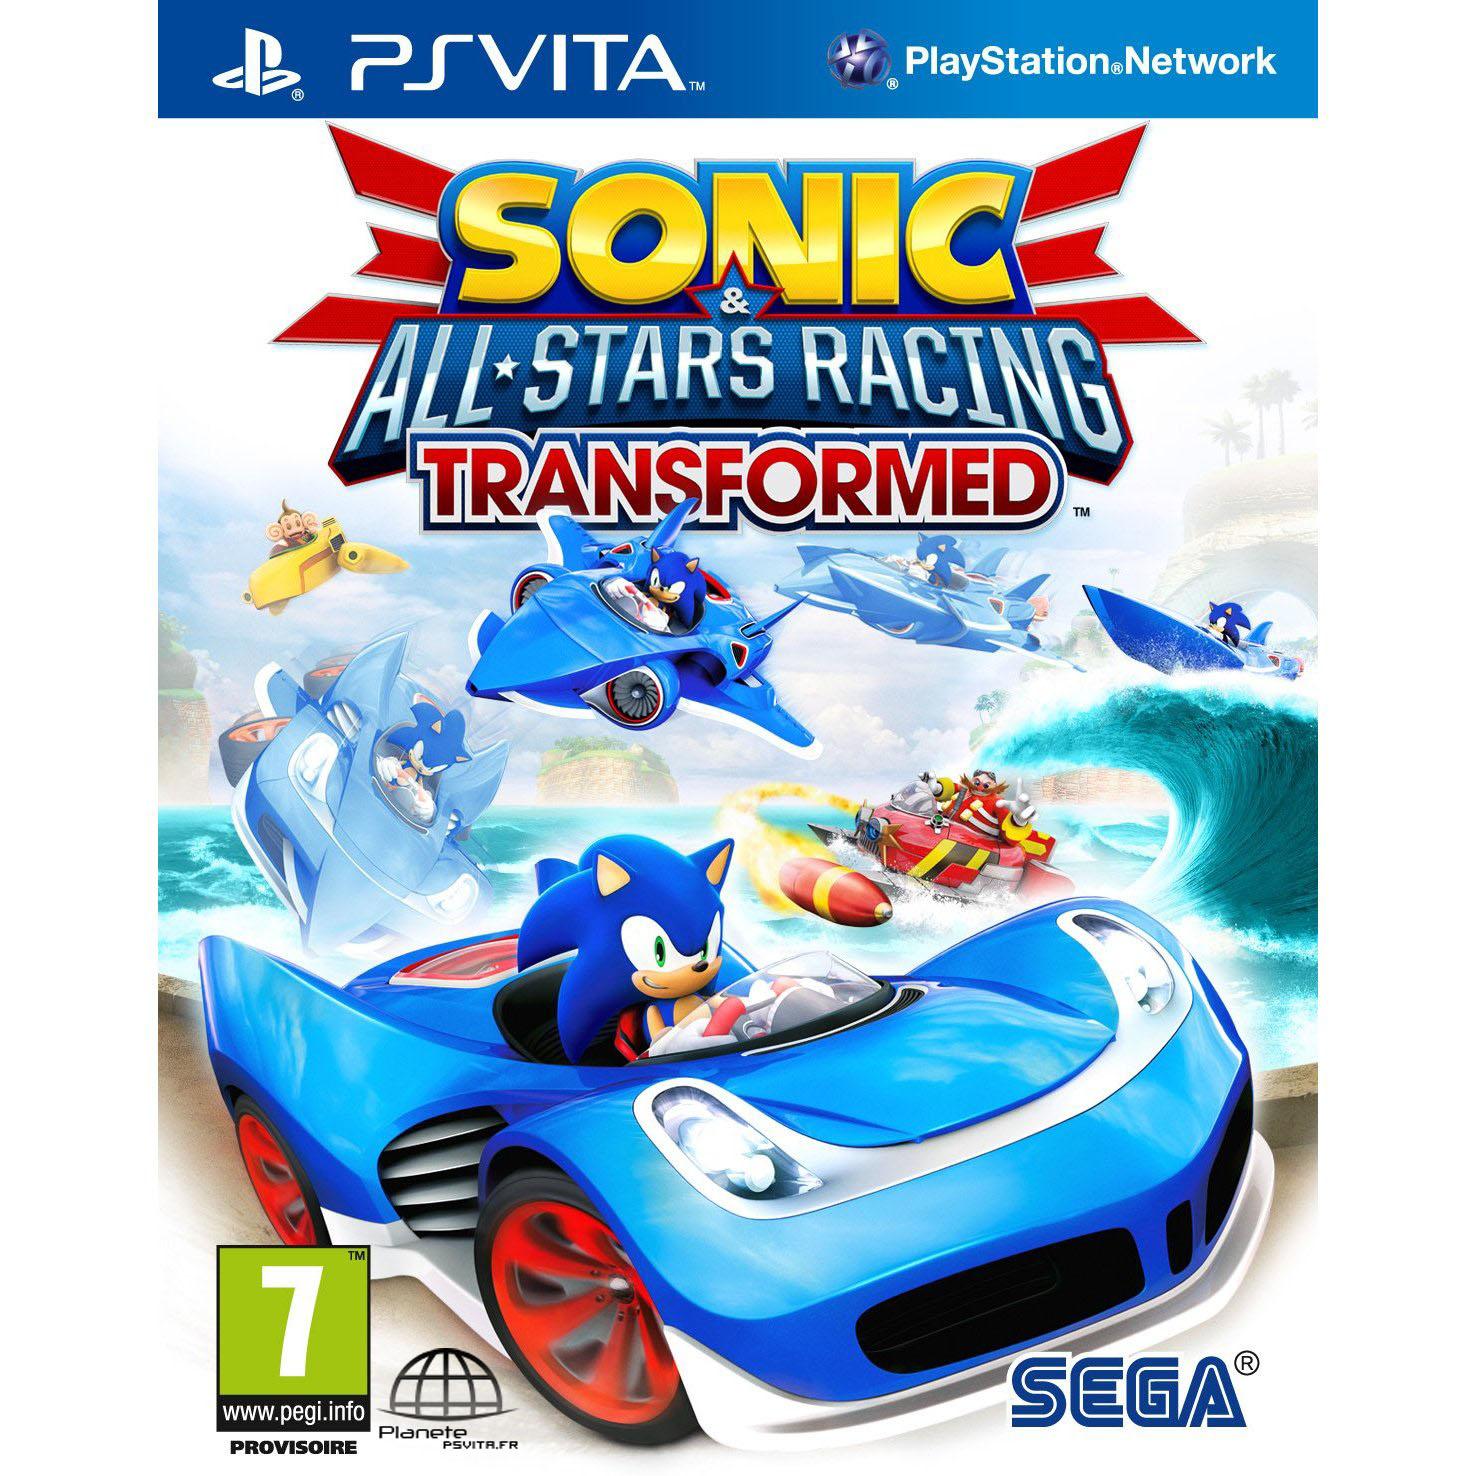 Sega Sonic All Stars Racing Transformed sur PS Vita